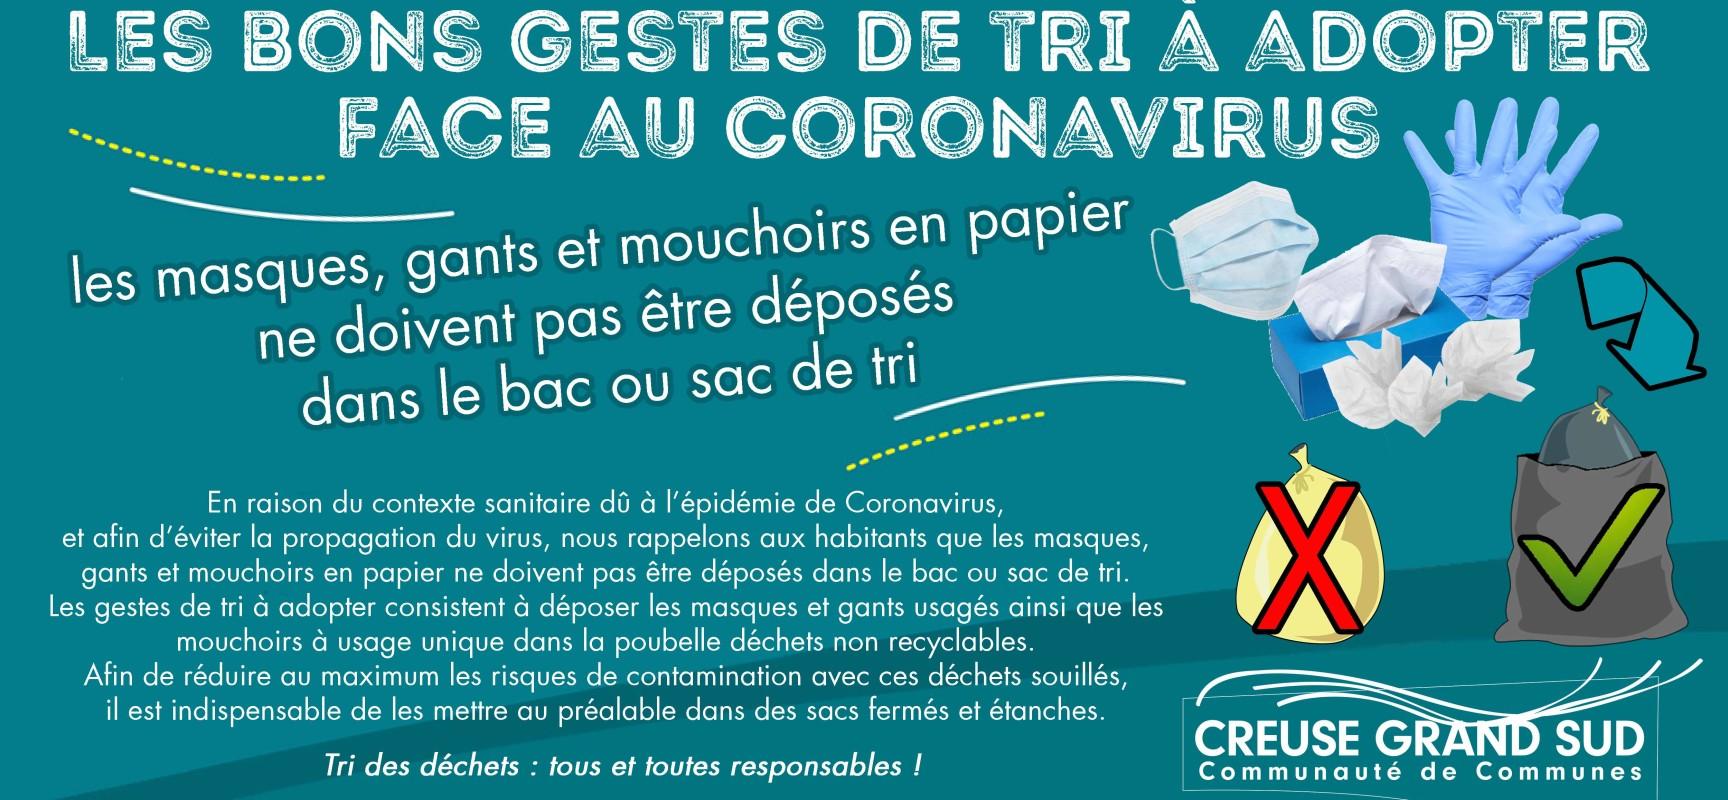 [Covid19] Les bons gestes de tri à adopter face au Coronavirus-Covid19